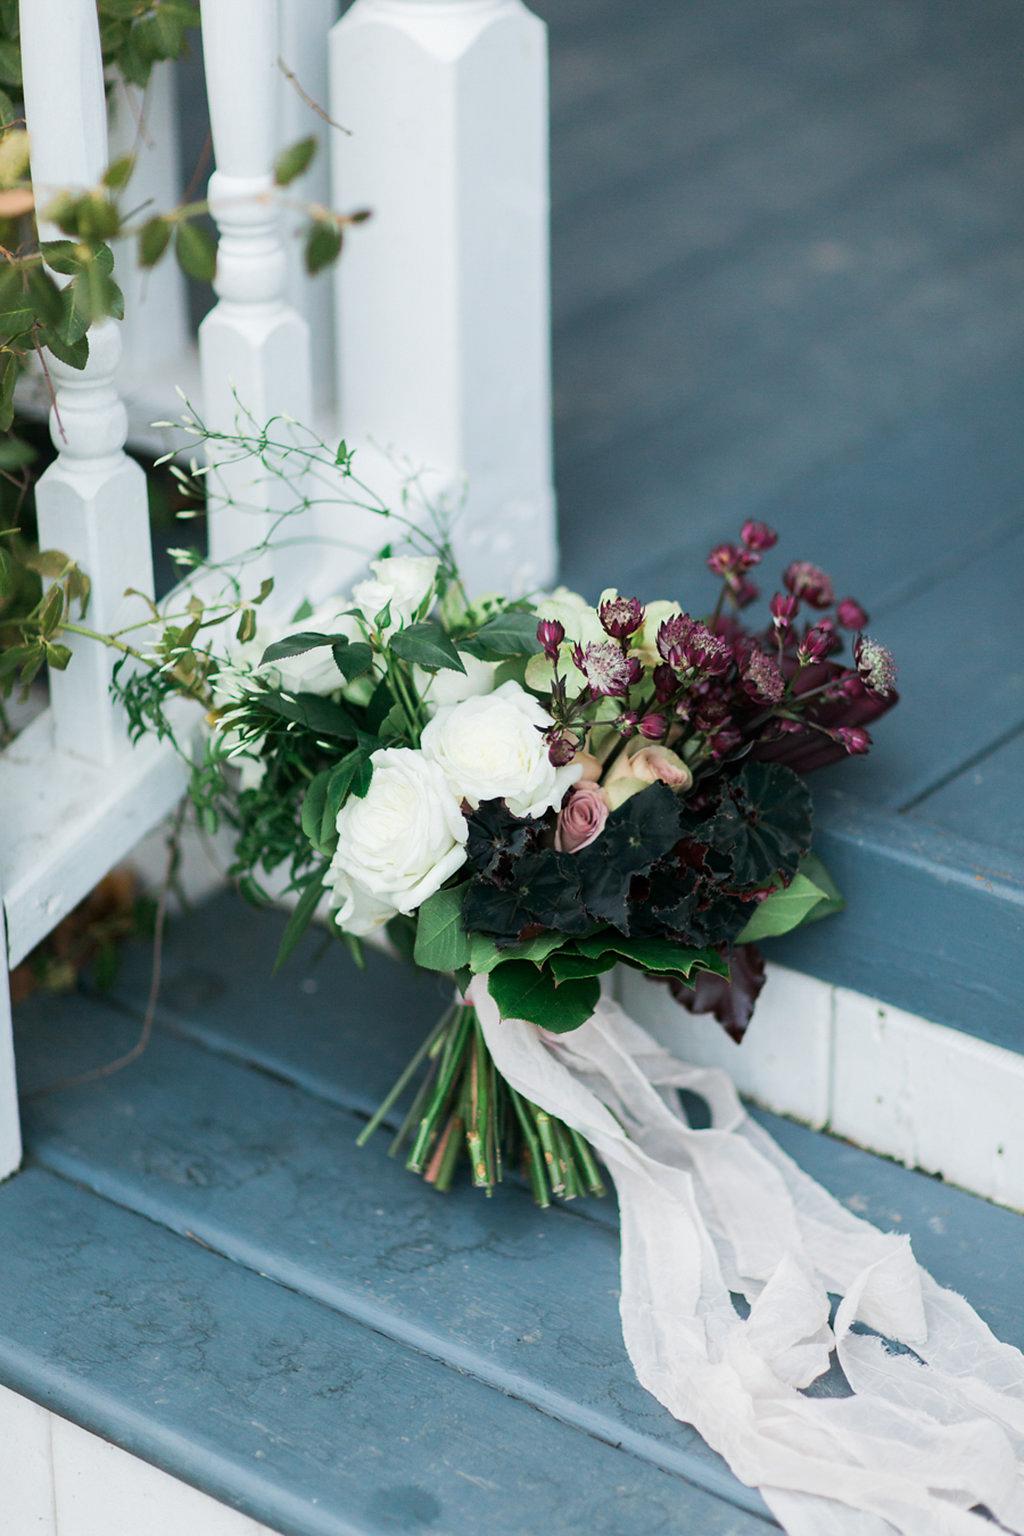 kayla-yestal-photography-vineyard-bride-swish-list-beamer-falls-manor-grimsby-engagement-2.jpg